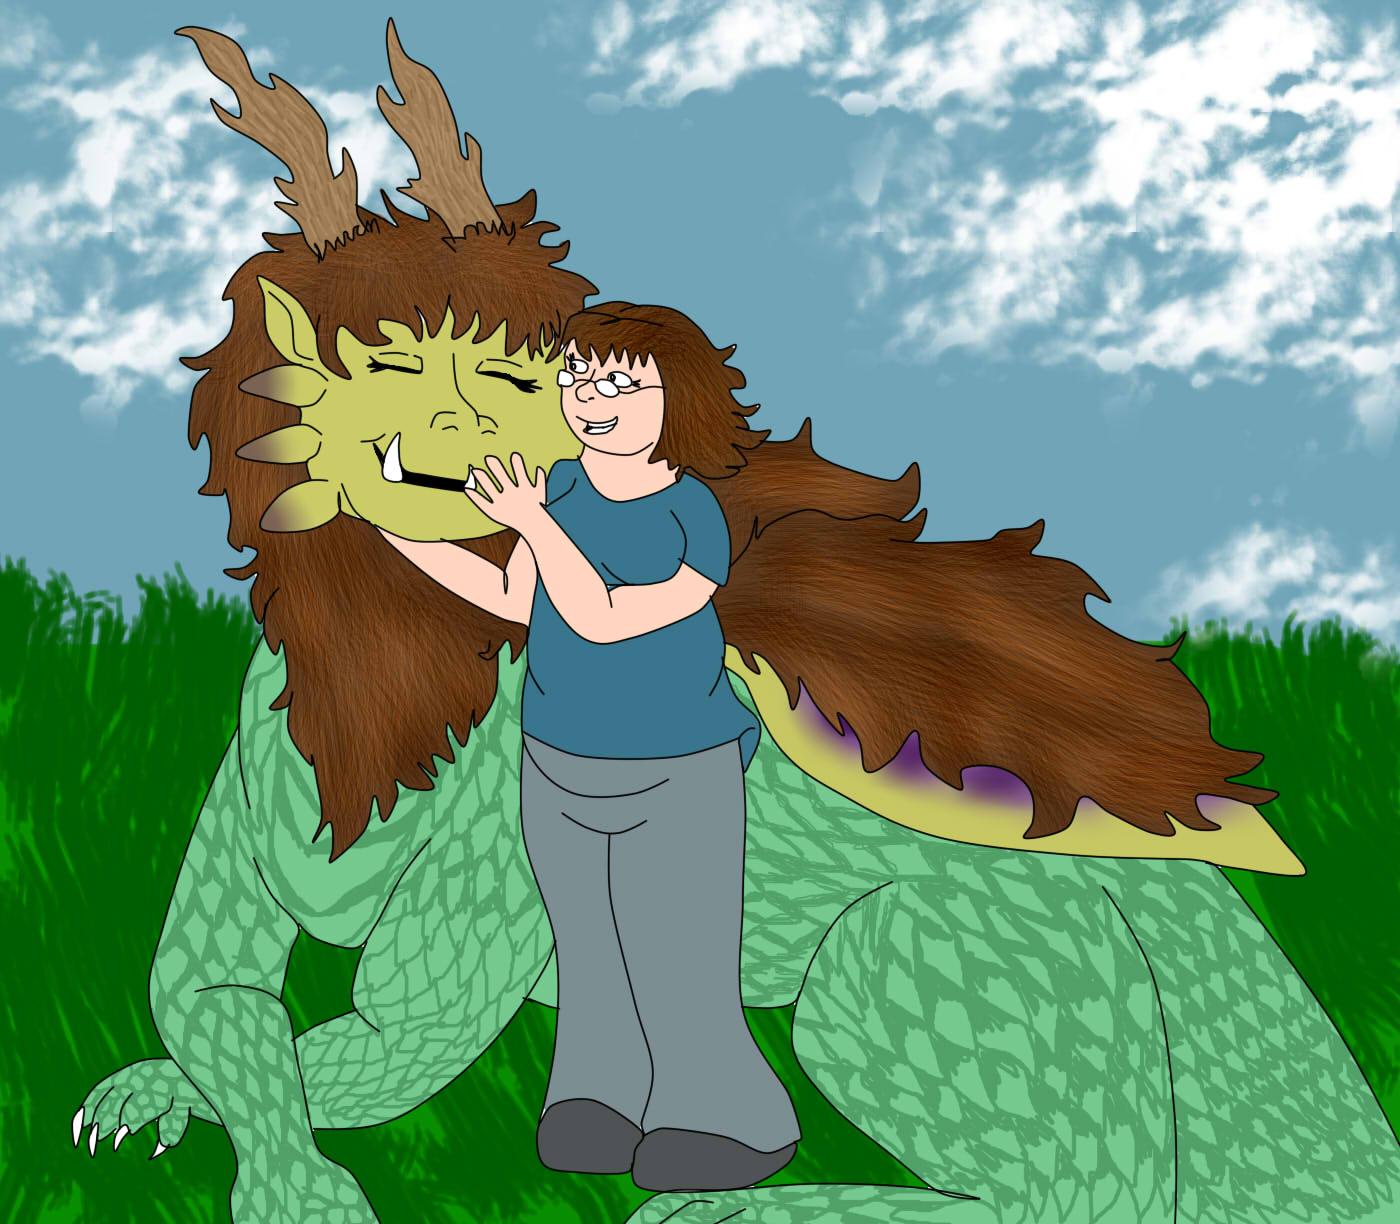 Midara and I by LadyALTernate